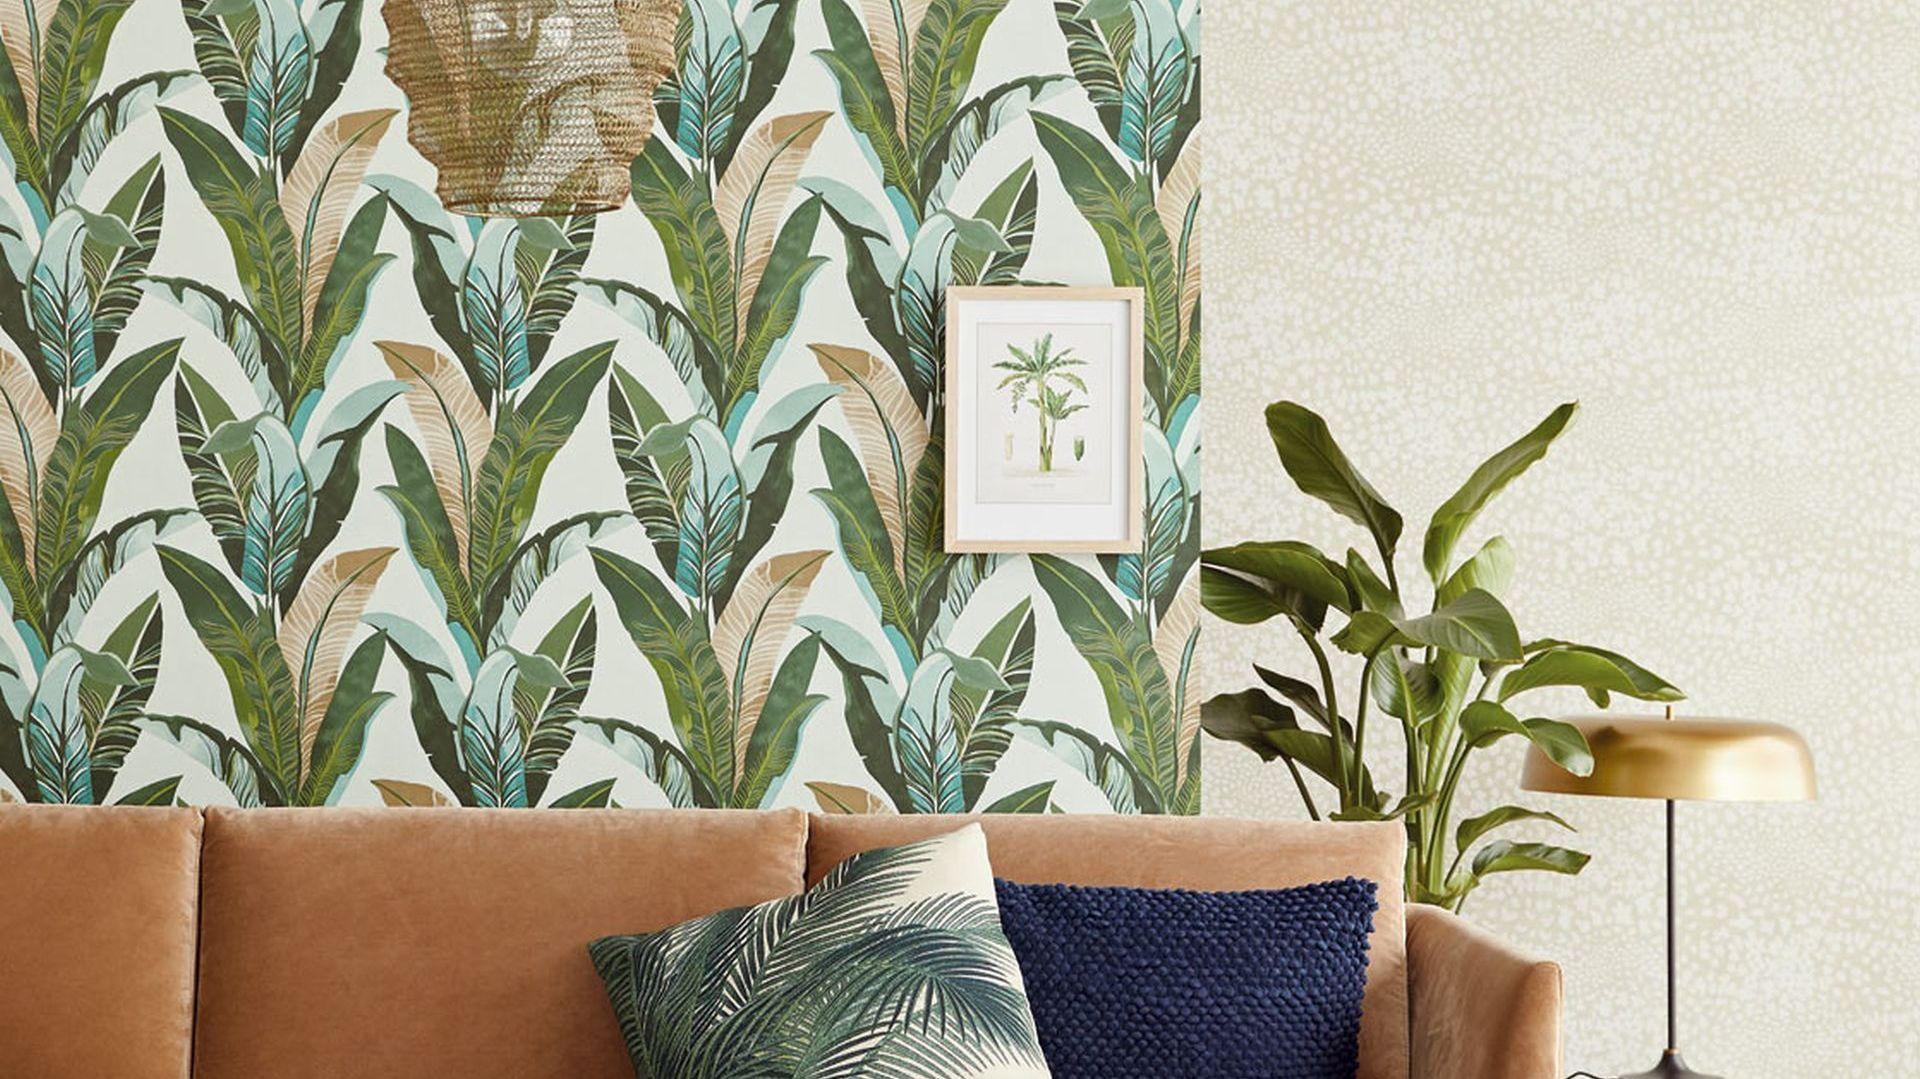 Tapeta z kolekcji Lime Lace, Tropical Leaves Wallpaper Light Blue dostępna w ofercie marki Eijffinger. Fot. Eijffinger